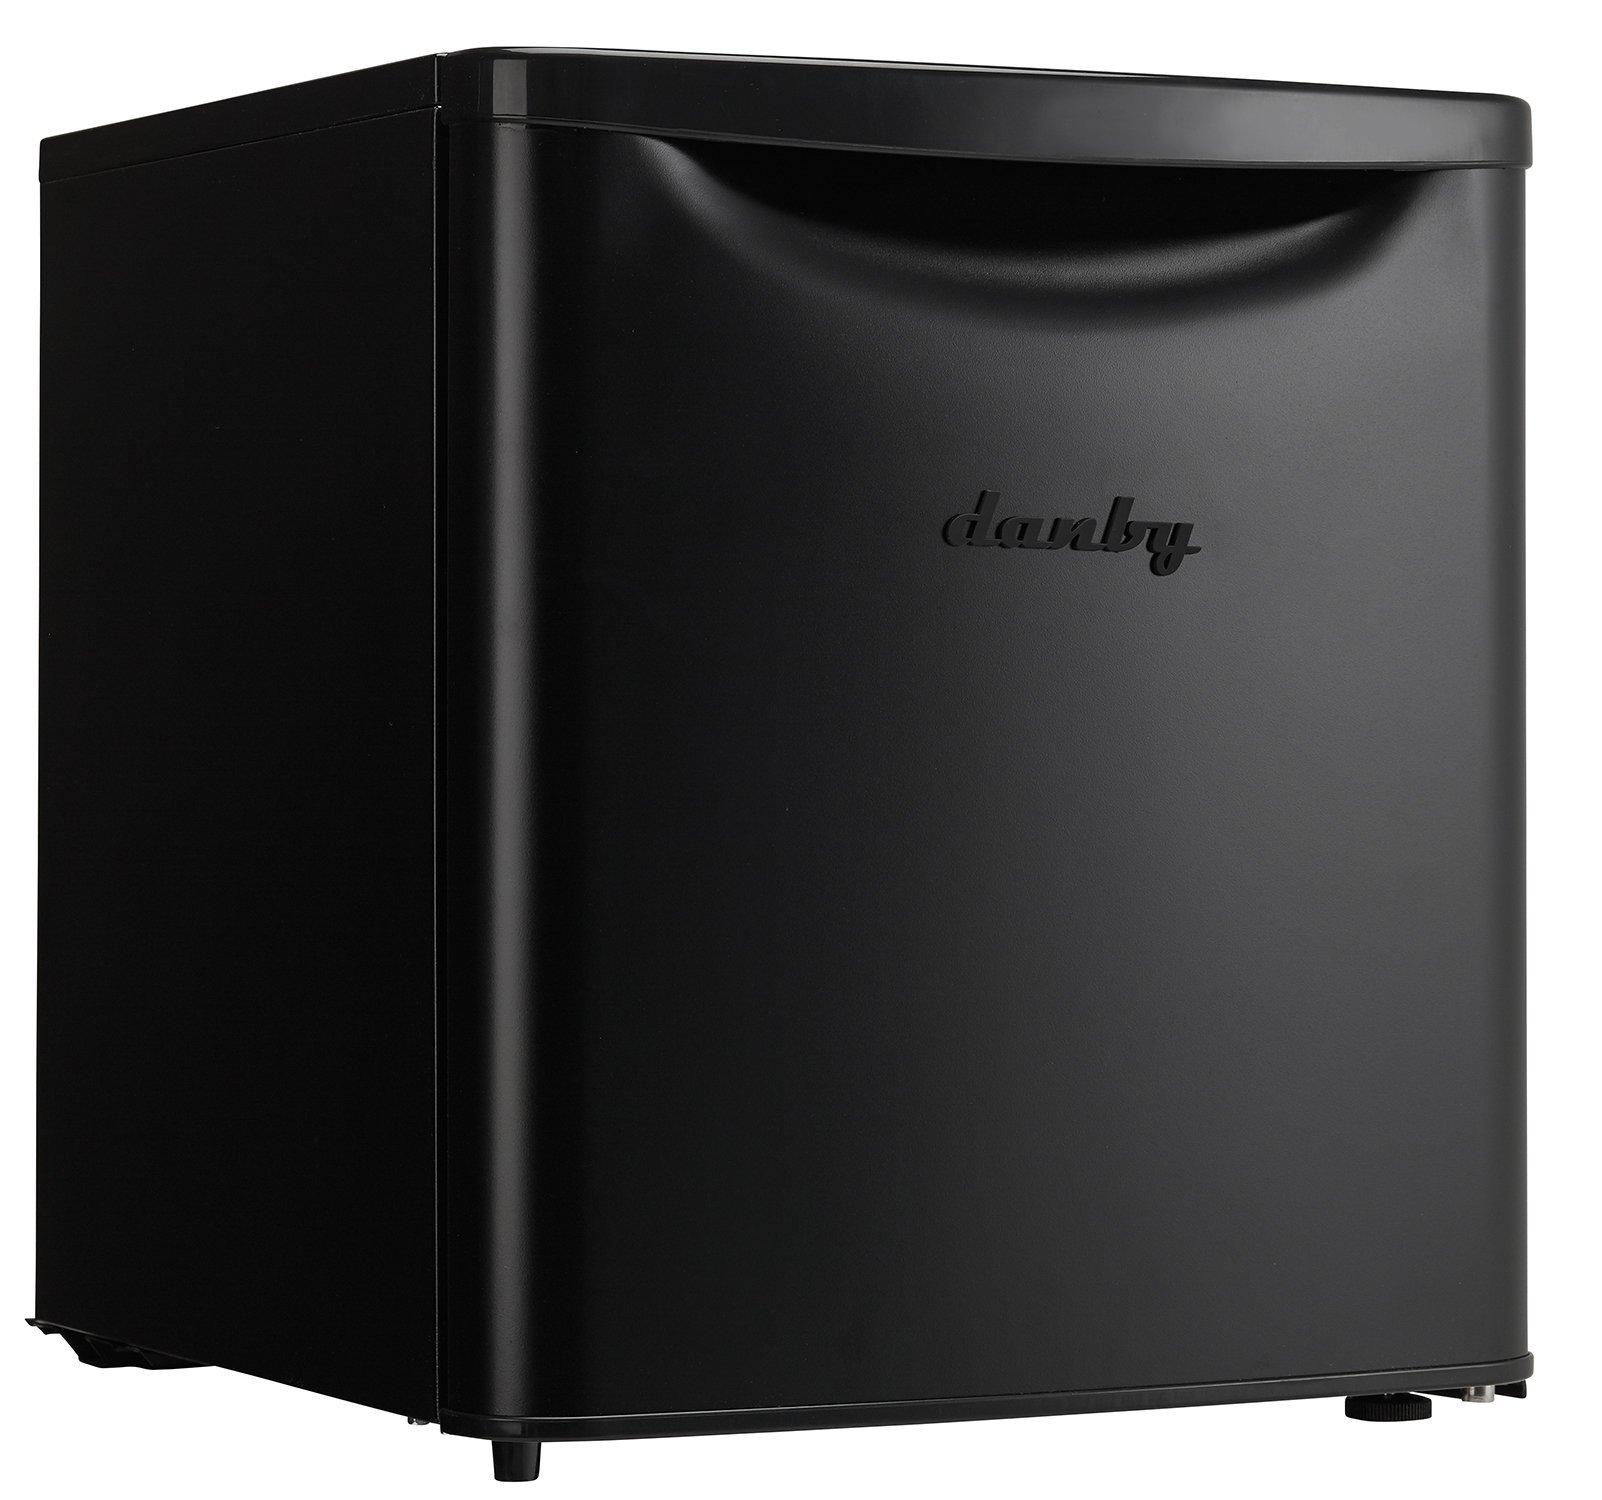 Danby DAR017A3BDB Contemporary Classic Compact All Refrigerator, Black by Danby